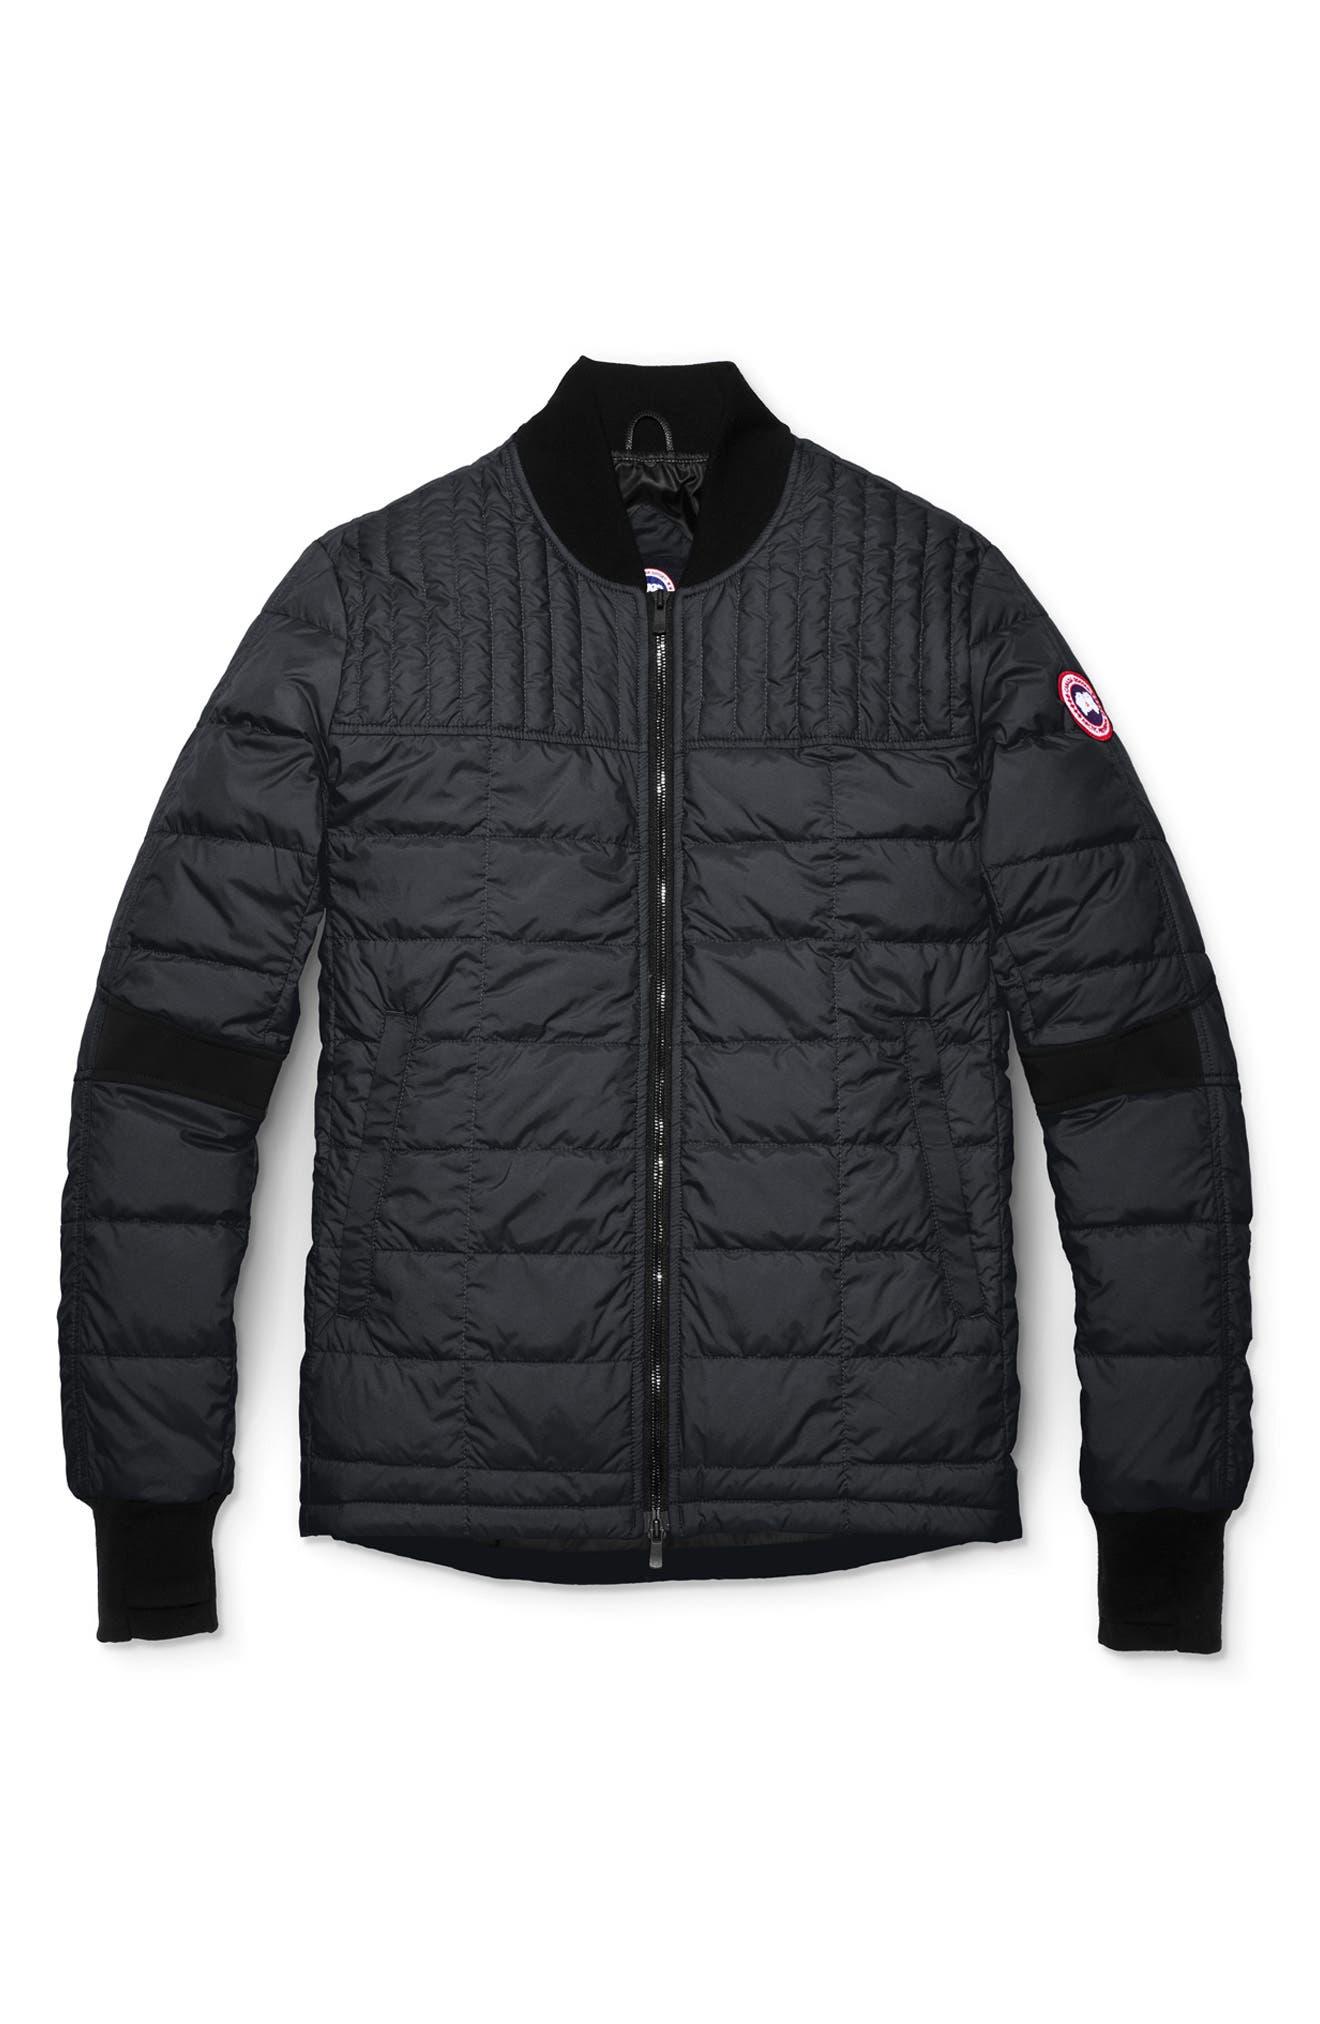 CANADA GOOSE, Dunham Slim Fit Packable Down Jacket, Main thumbnail 1, color, 001